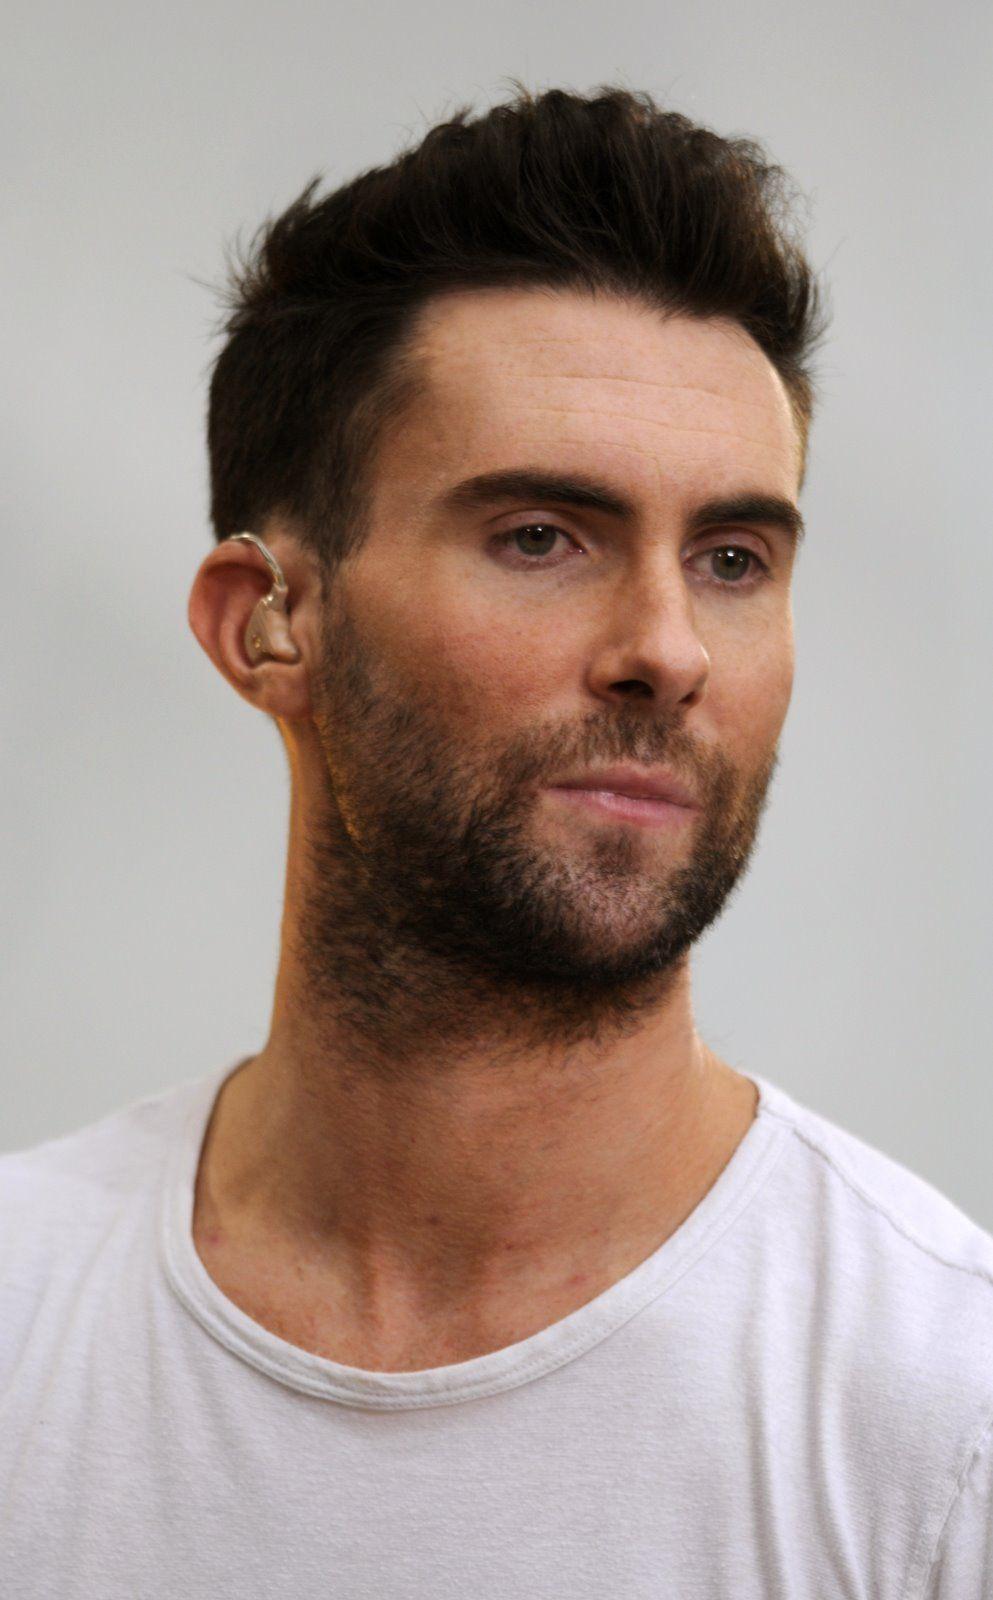 Mens haircuts with beards medium haircut for men  haircut ideas for tink  pinterest  medium